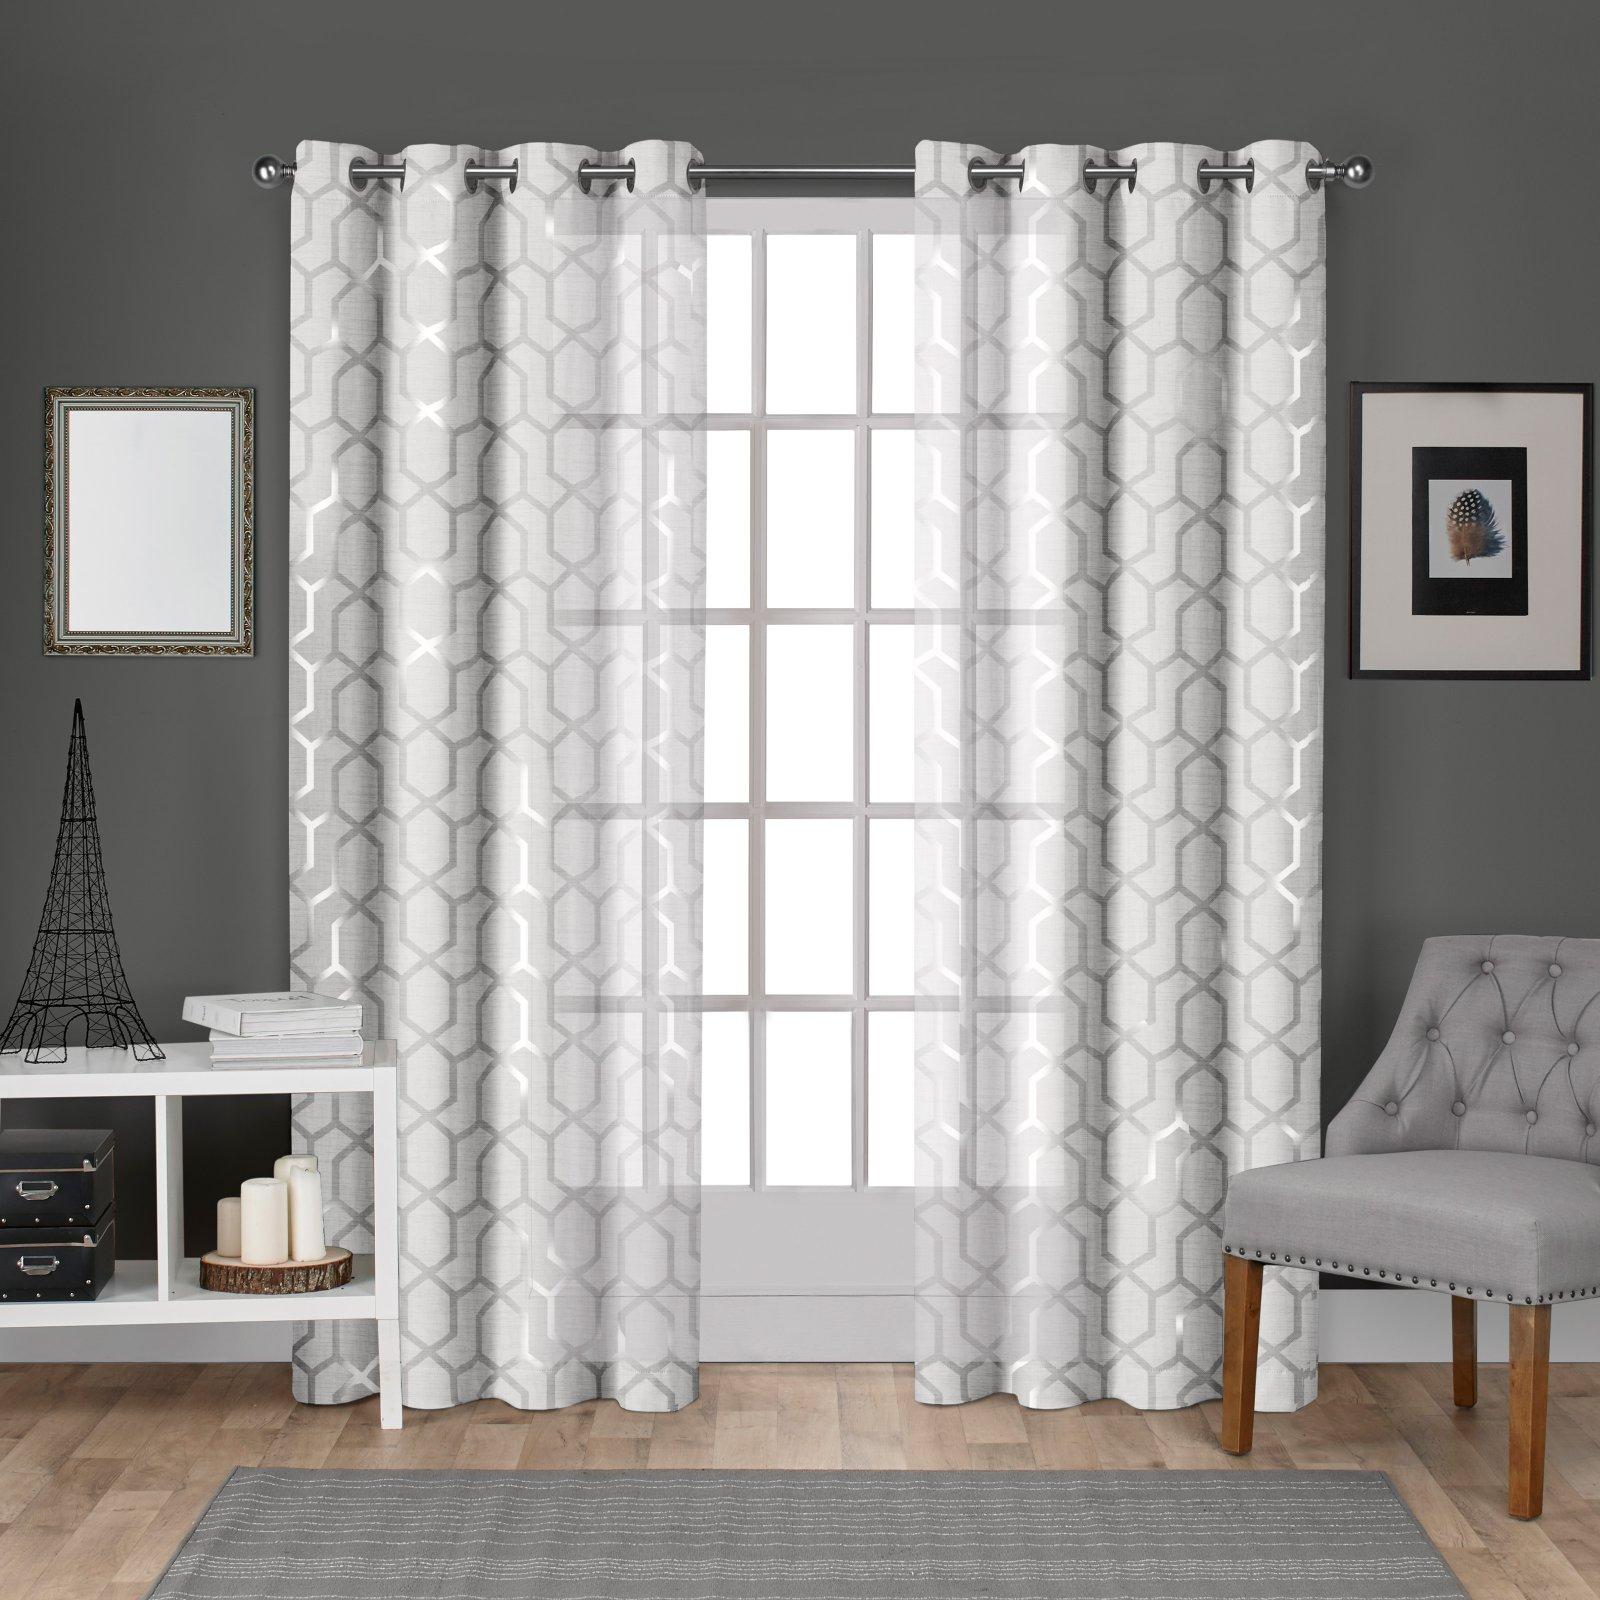 Exclusive Home Curtains 2 Pack Panza Metallic Geometric Print Sheer Grommet Top Curtain Panels